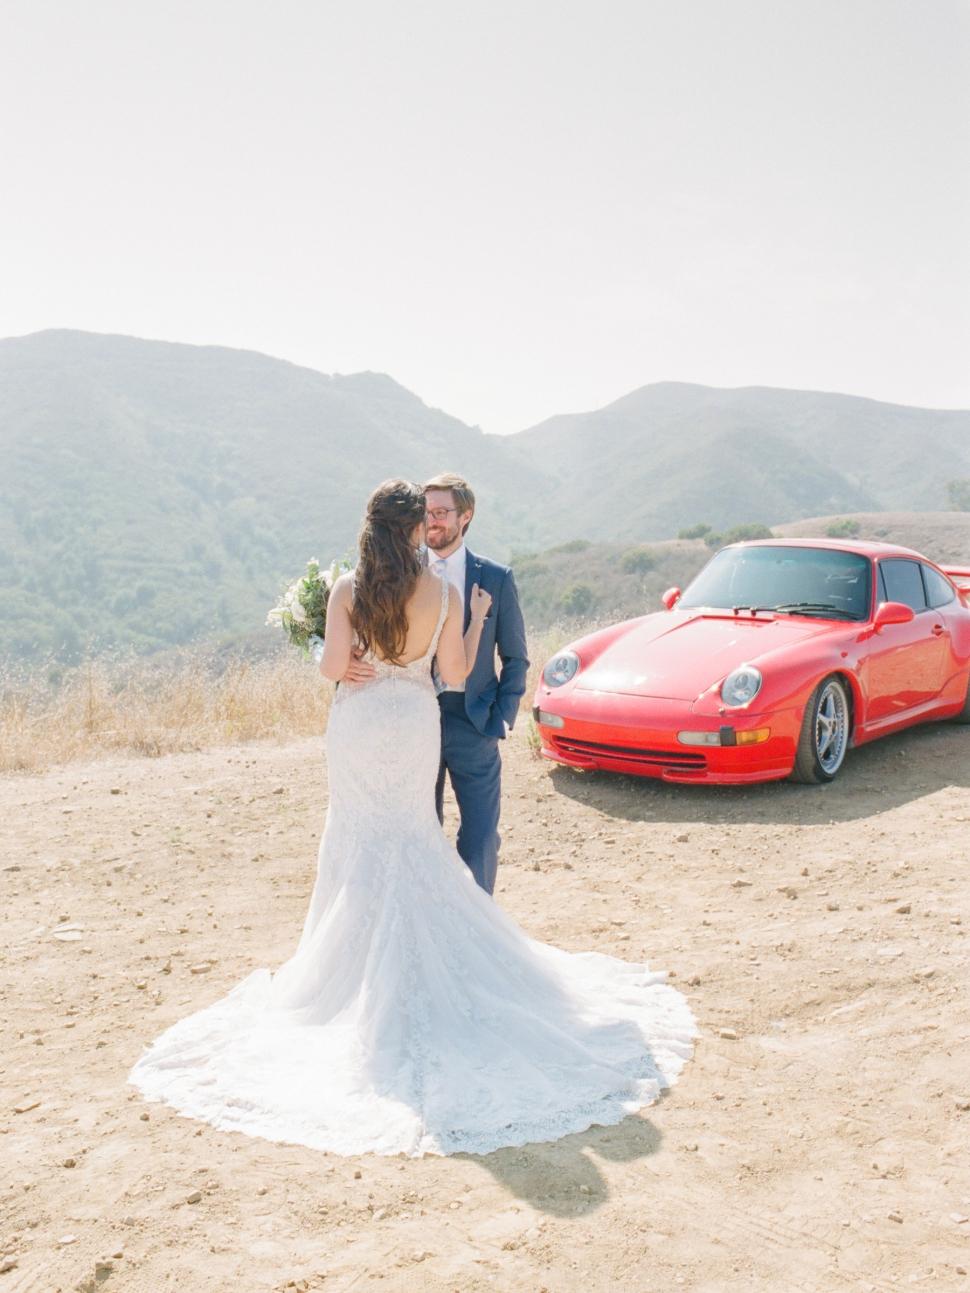 Malibu-Wedding-Photographer-Cassi-Claire-Malibu-West-Beach-Club-Wedding_13.jpg